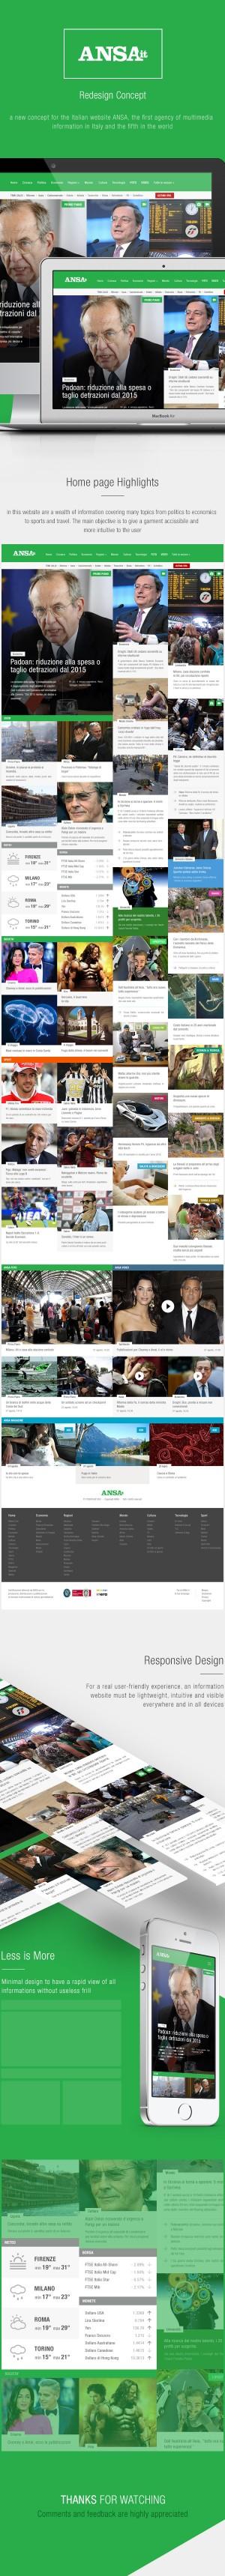 Ansa | Italian media agency Redesign Concept :: A new concept for the Italian website ANSA, the  ...